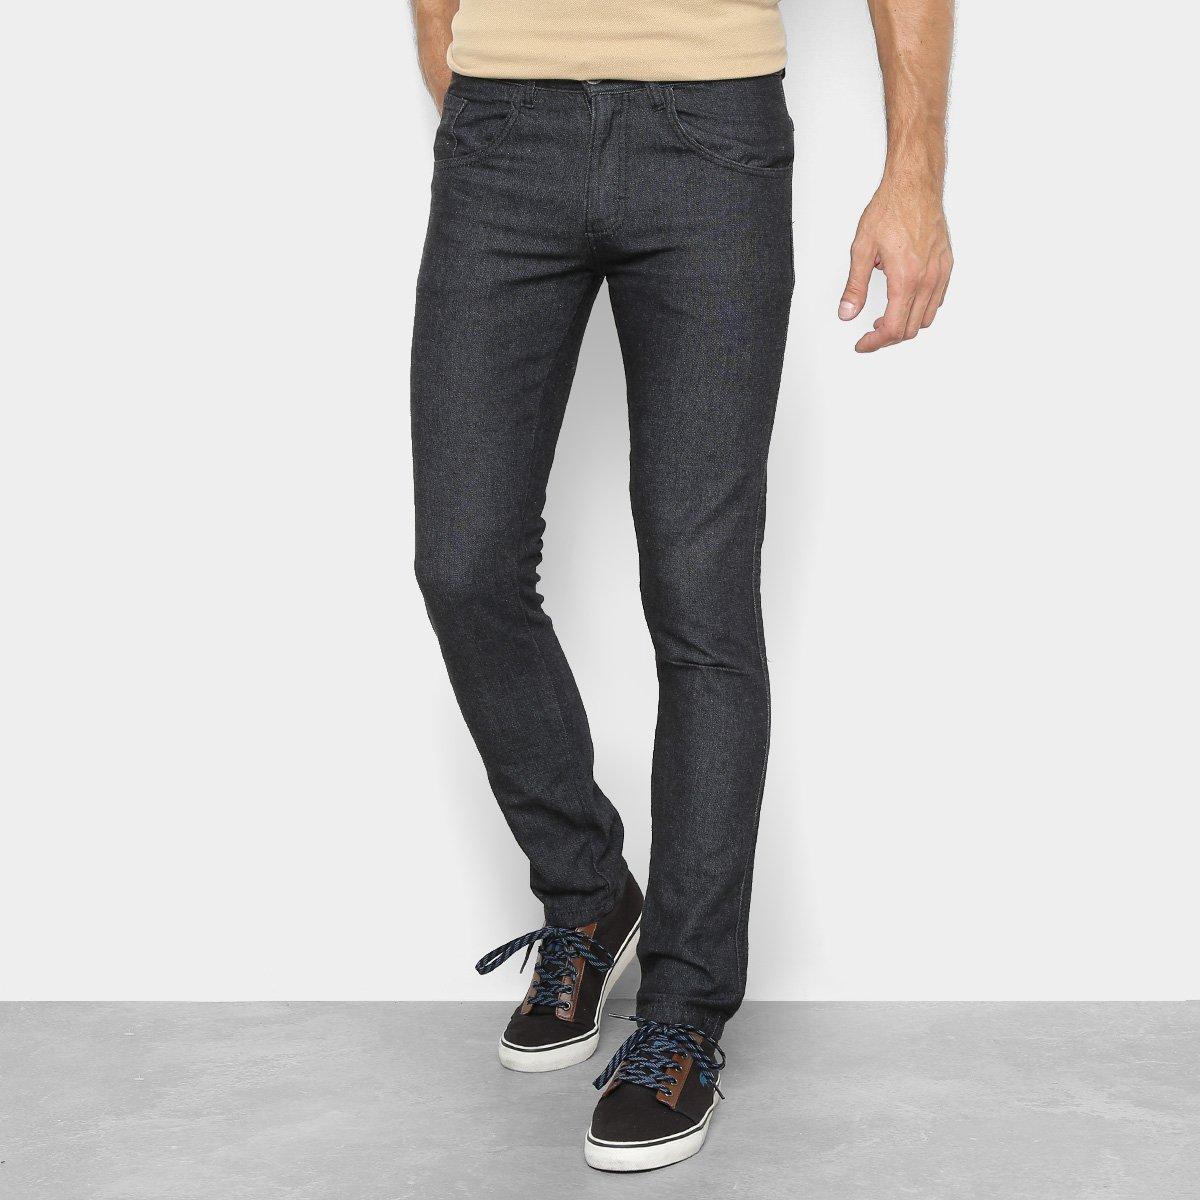 29e21cd02 40%OFF Calça Jeans Preston Tradicional Masculina